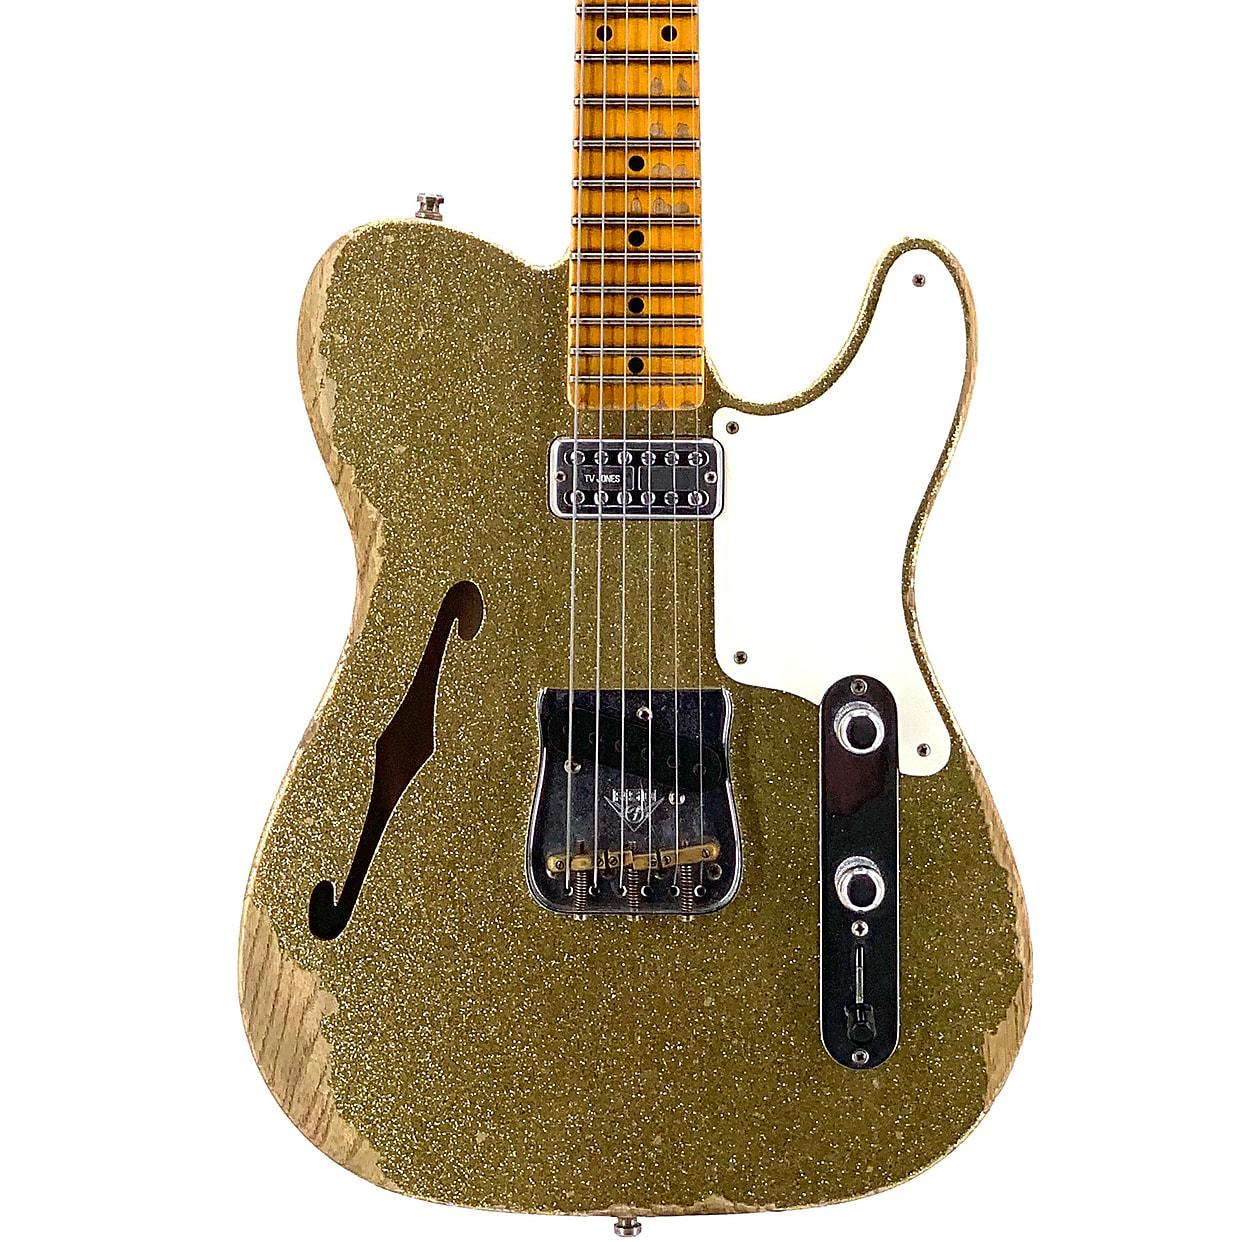 Fender Custom Shop Limited Edition Heavy Relic Telecaster Caballo Tono Ligero